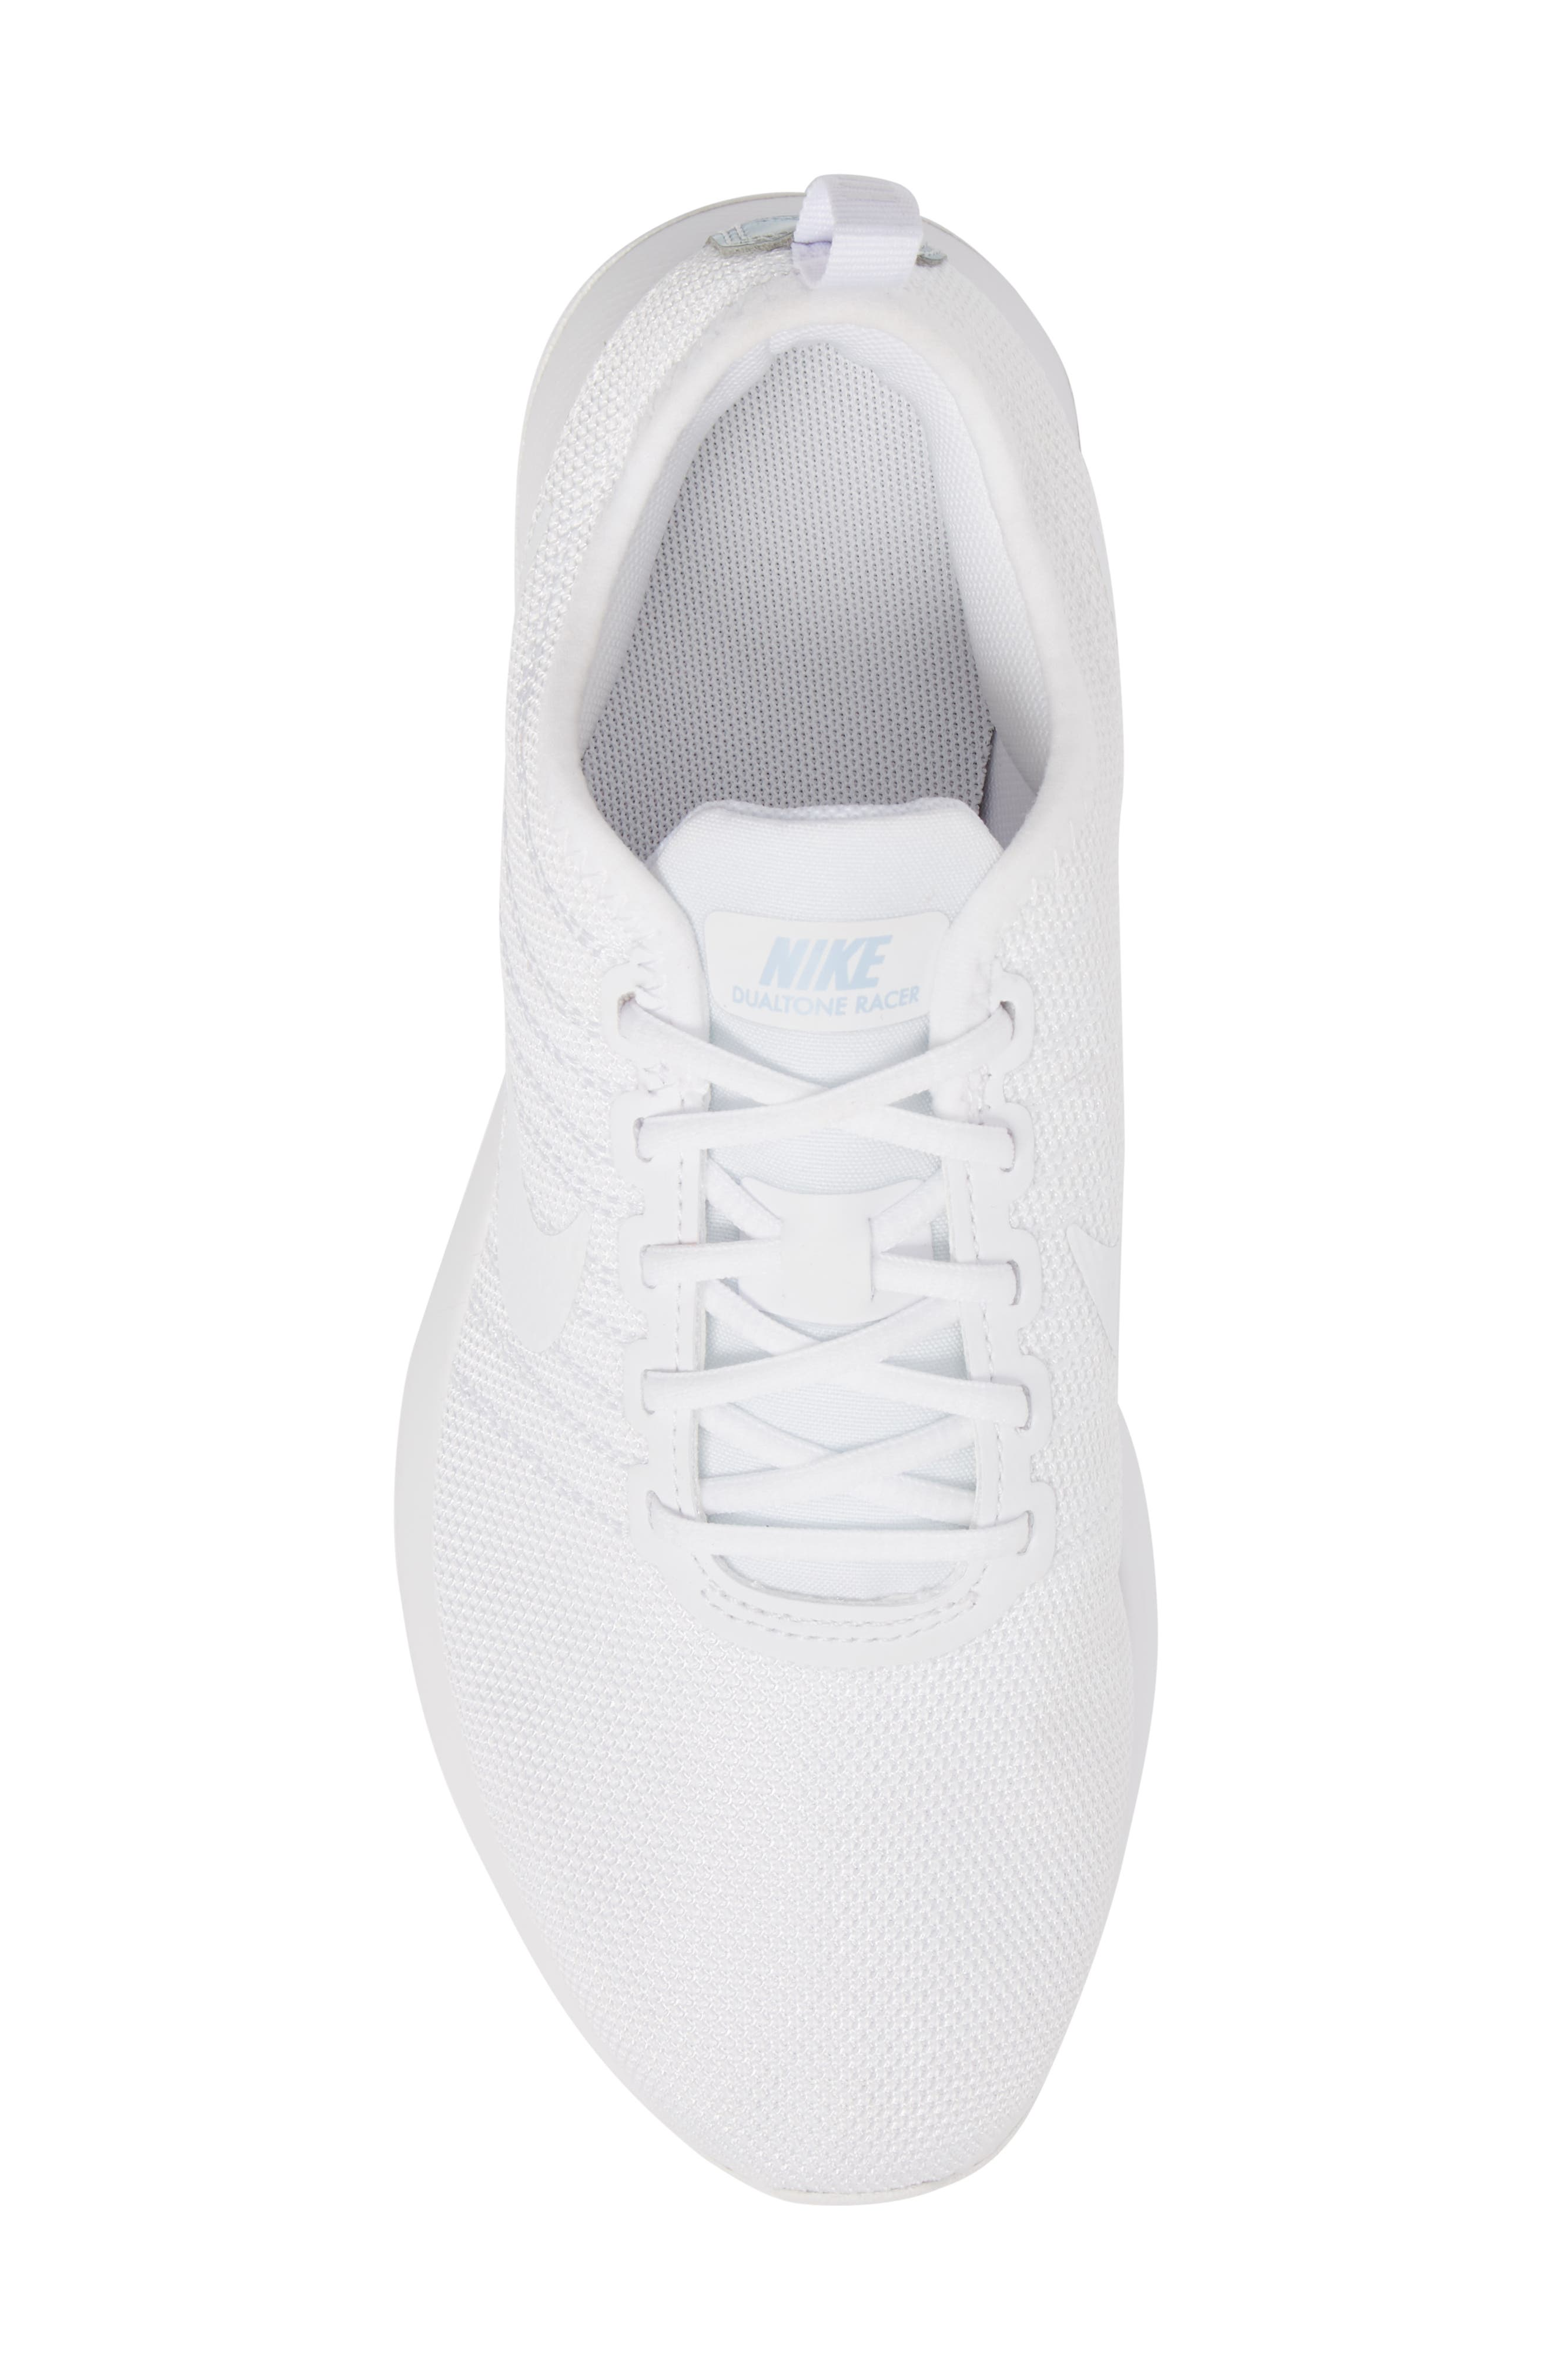 Dualtone Racer GS Sneaker,                             Alternate thumbnail 20, color,